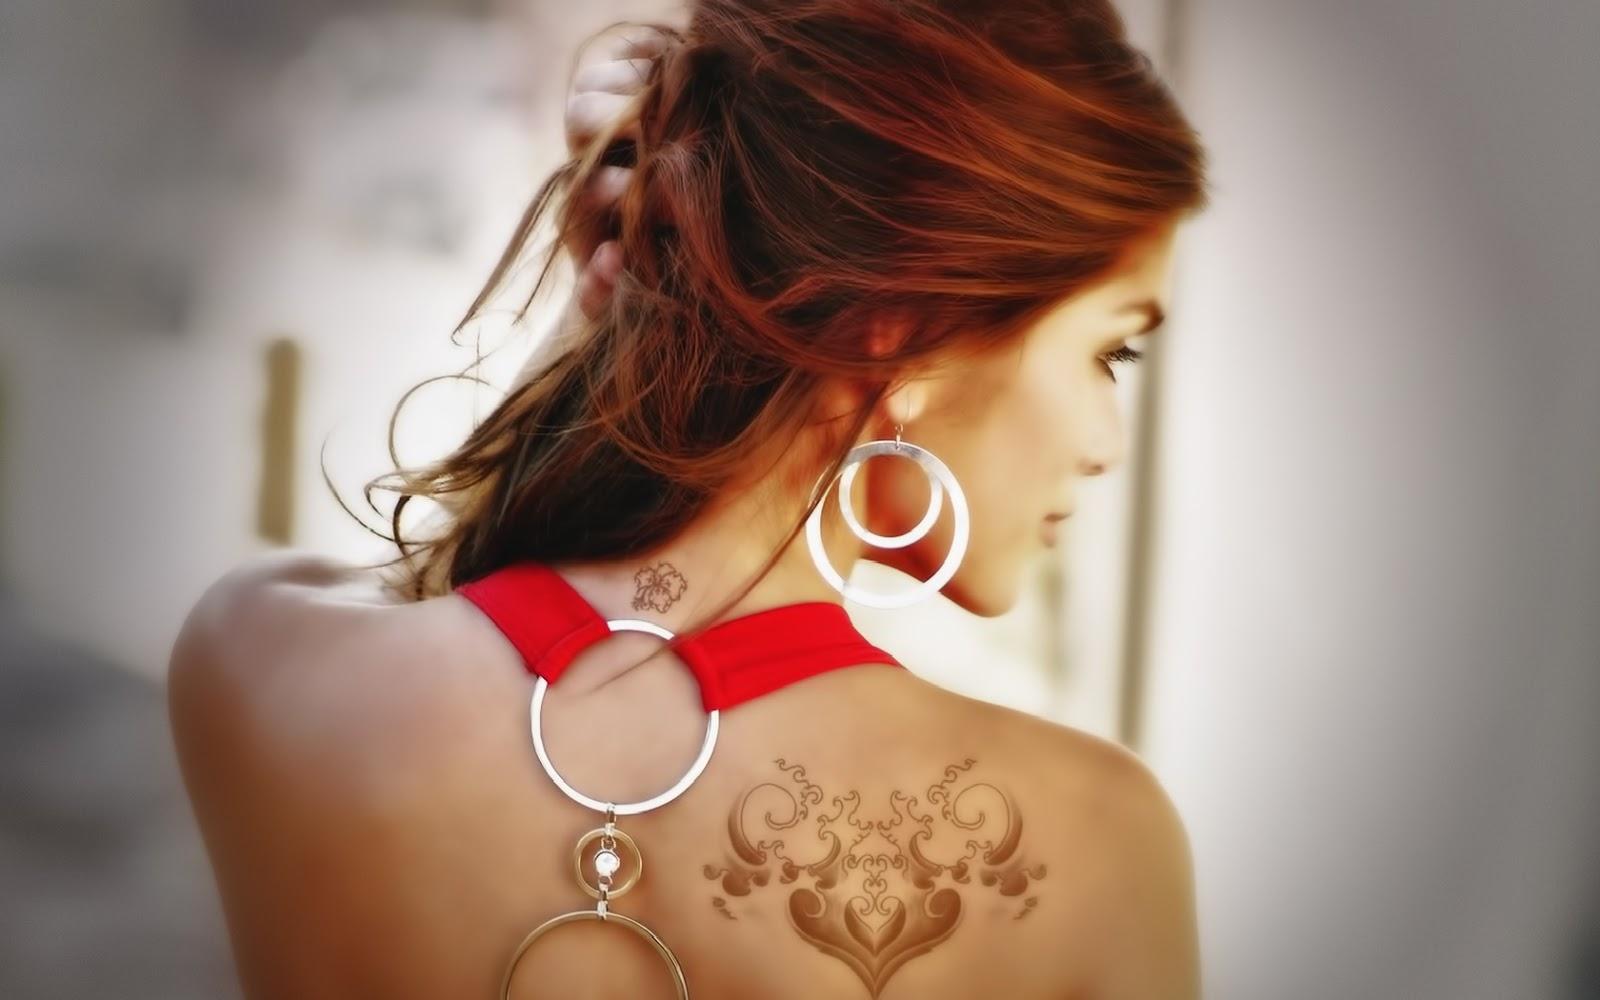 http://1.bp.blogspot.com/-HYtJ3S969Uw/UPWUqvWgaYI/AAAAAAAACEc/EvtxW4RyIDQ/s1600/New+HD+Girls+Wallpapers.jpg